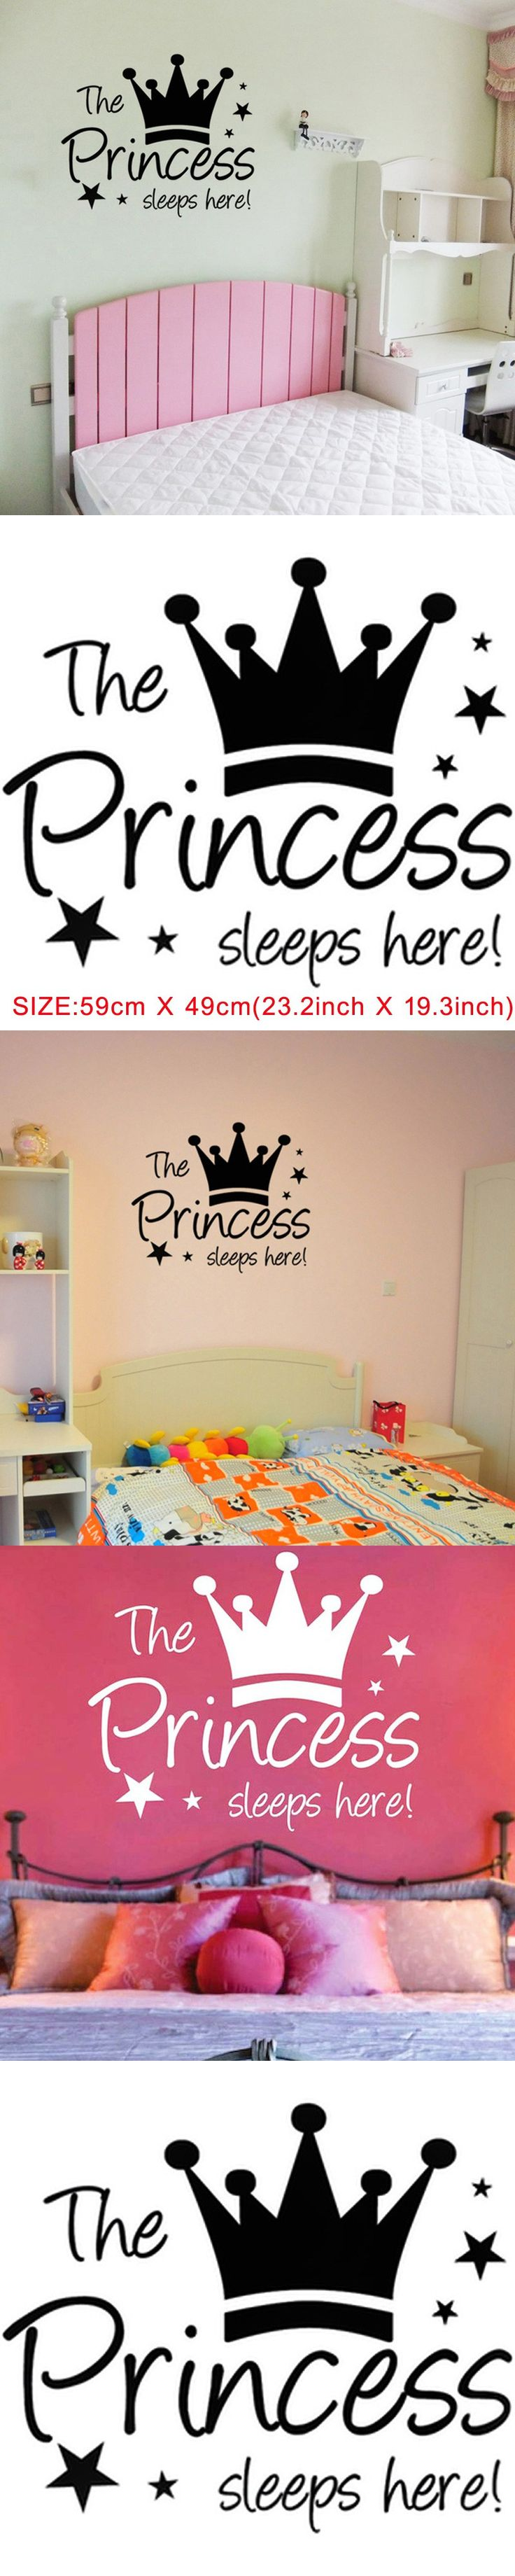 3d butterfly mural wall sticker decor decal pop up stickers art - The Princess Sleeps Here Girls Wall Sticker Cute Crown Diy Home Decor Vinyl Wall Decal For Bedroom 59x49cm